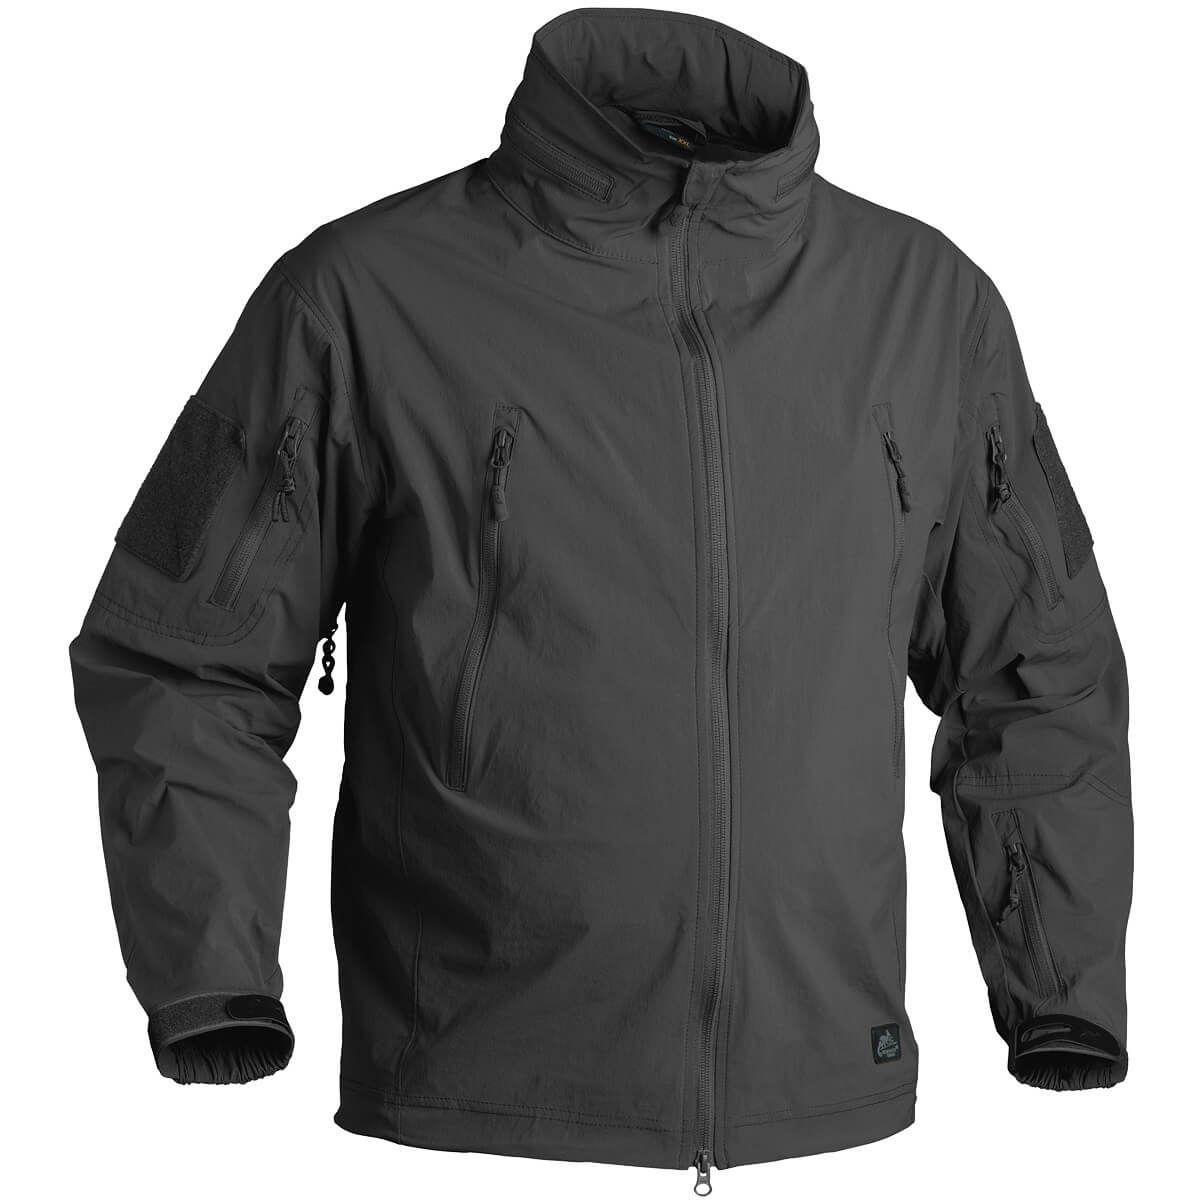 Куртка Helikon Trooper Soft Shell Jacket Black (разные размеры), куртка софт шелл, ветровка (KU-TRP-NL-01) 50